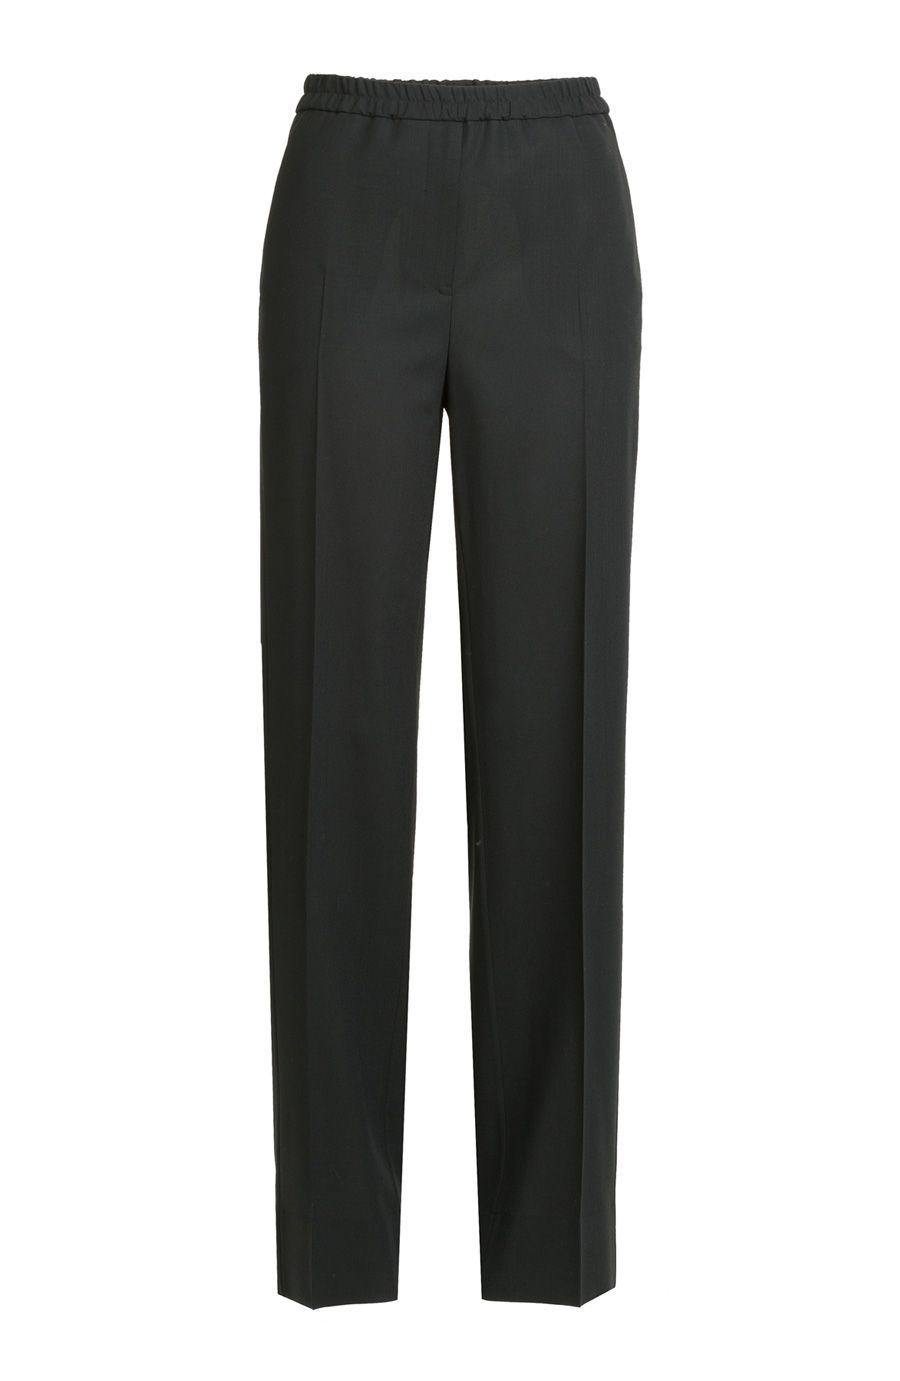 JIL SANDER Wool Wide Leg Pants. #jilsander #cloth #pants